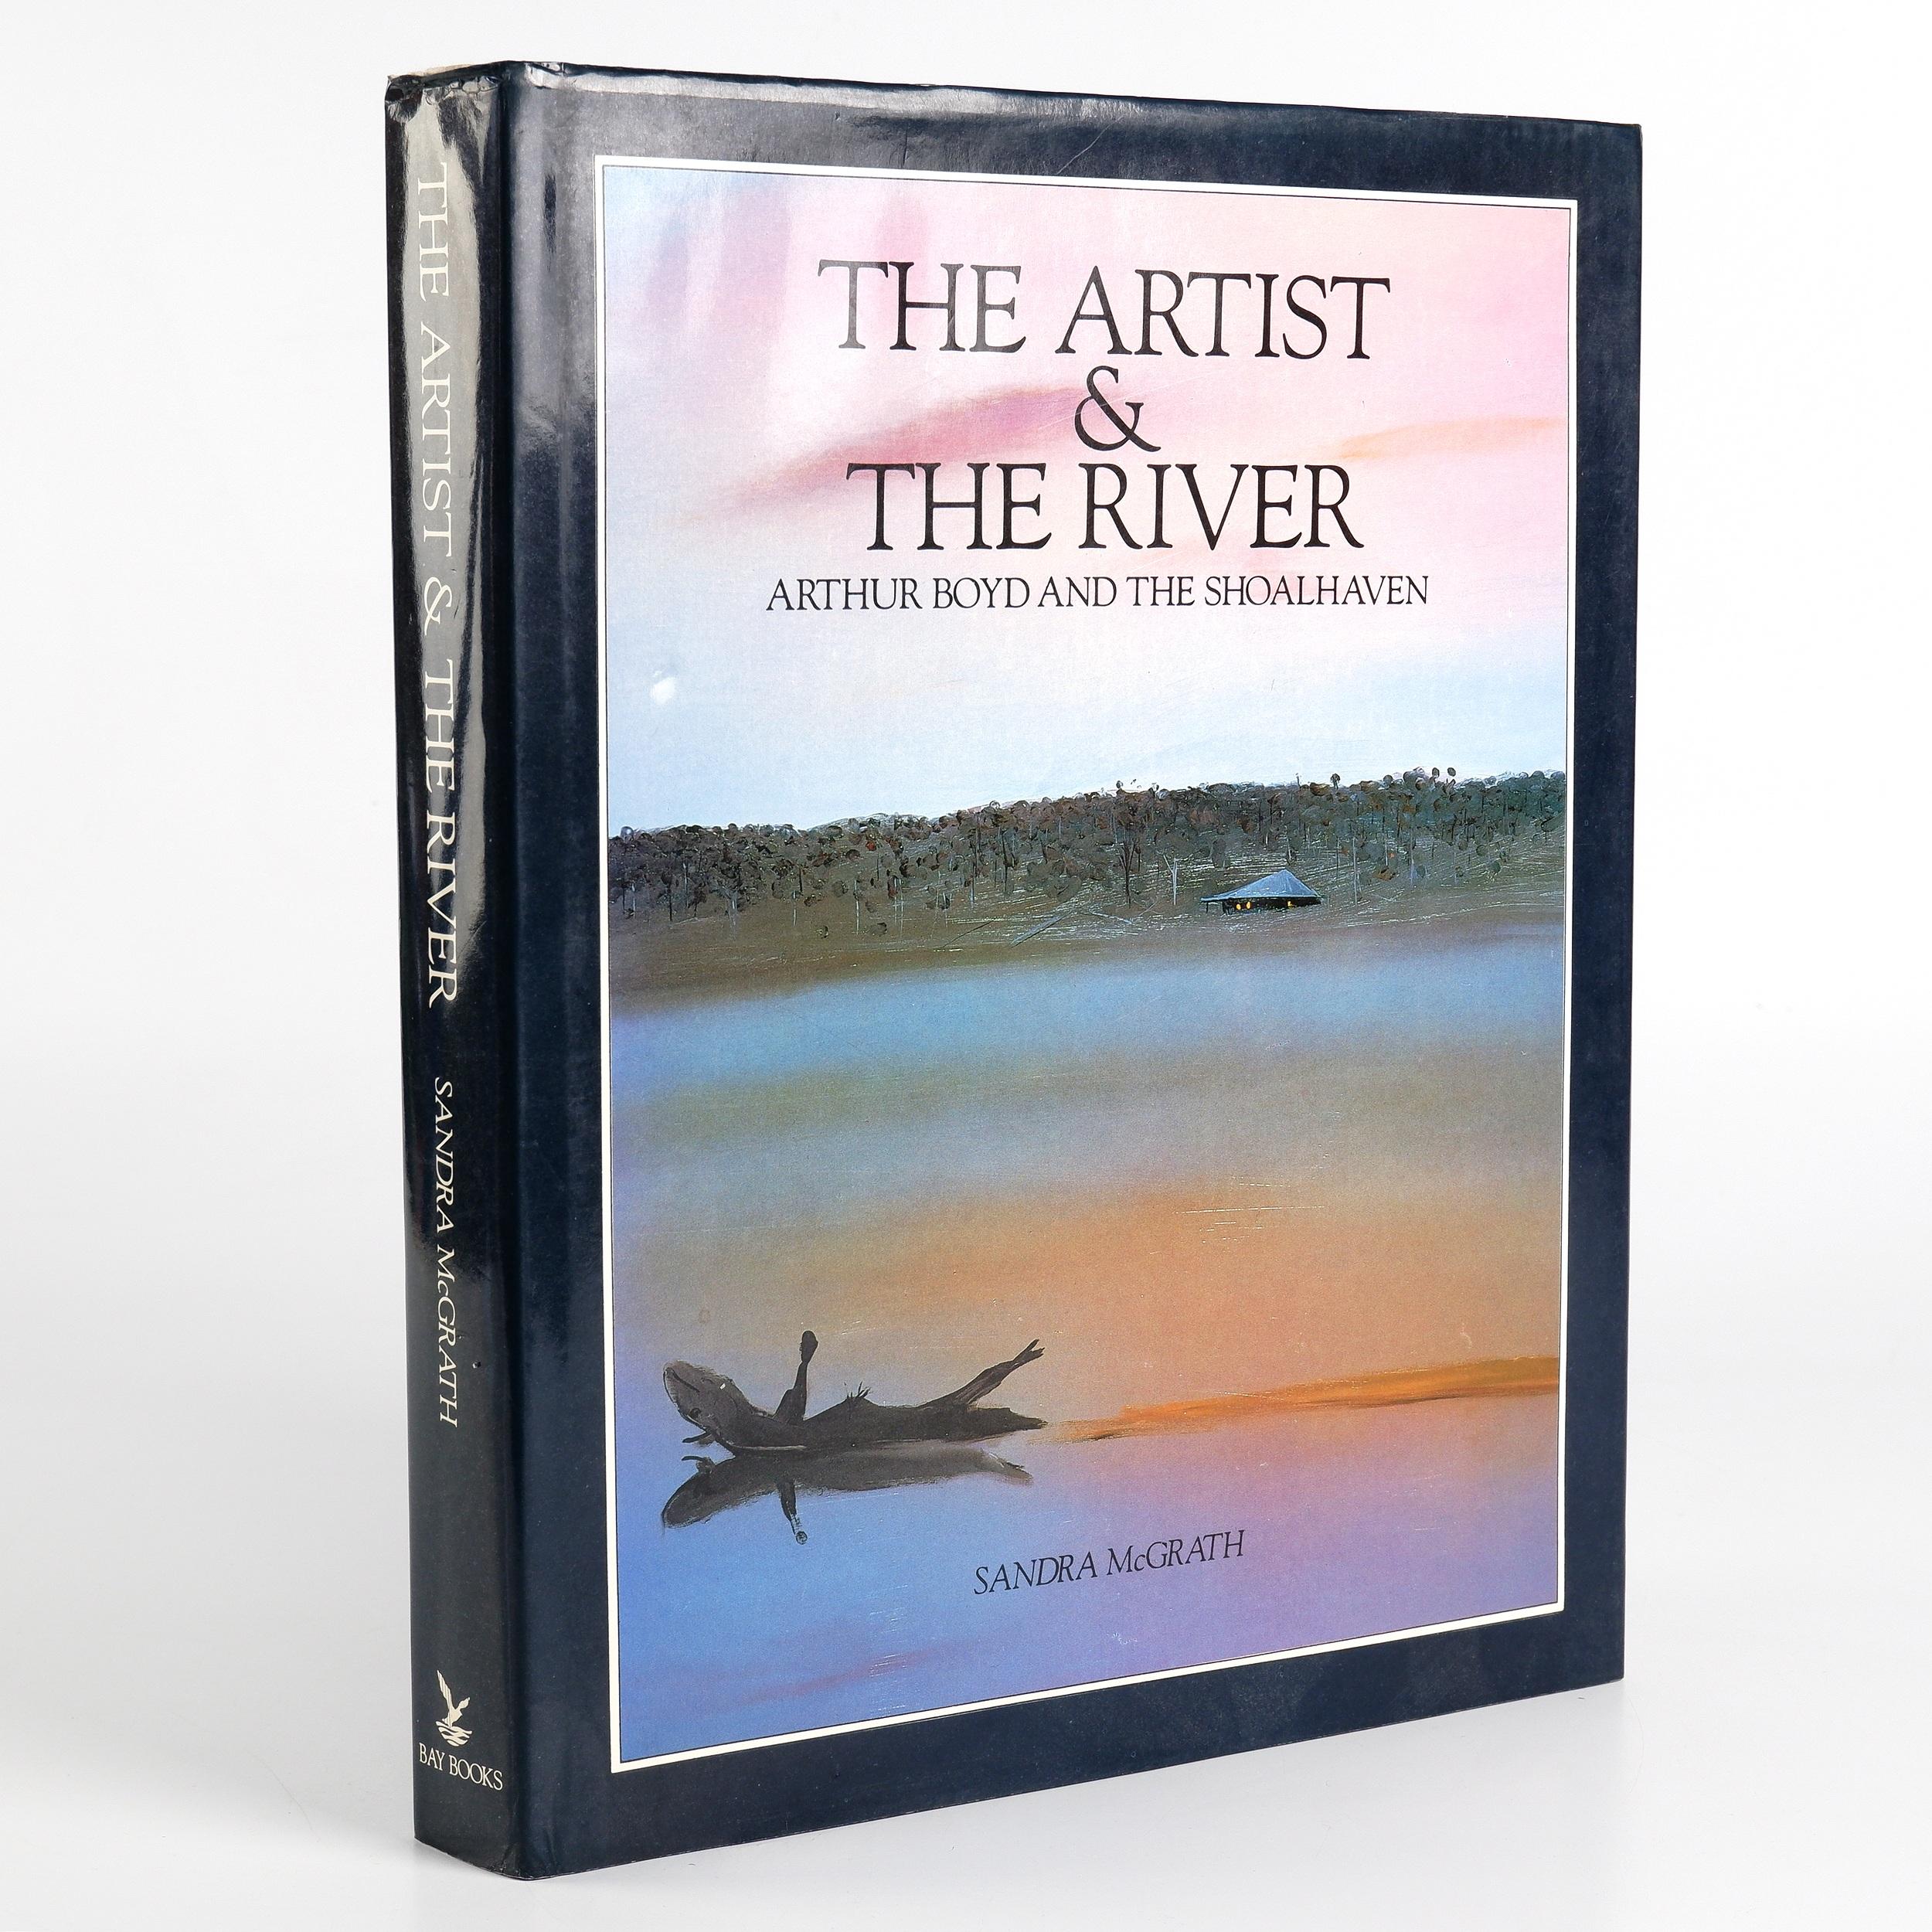 'McGrath, Sandra, The Artist & The River, Arthur Boyd & the Shoalhaven, Bay Books, Sydney 1982'